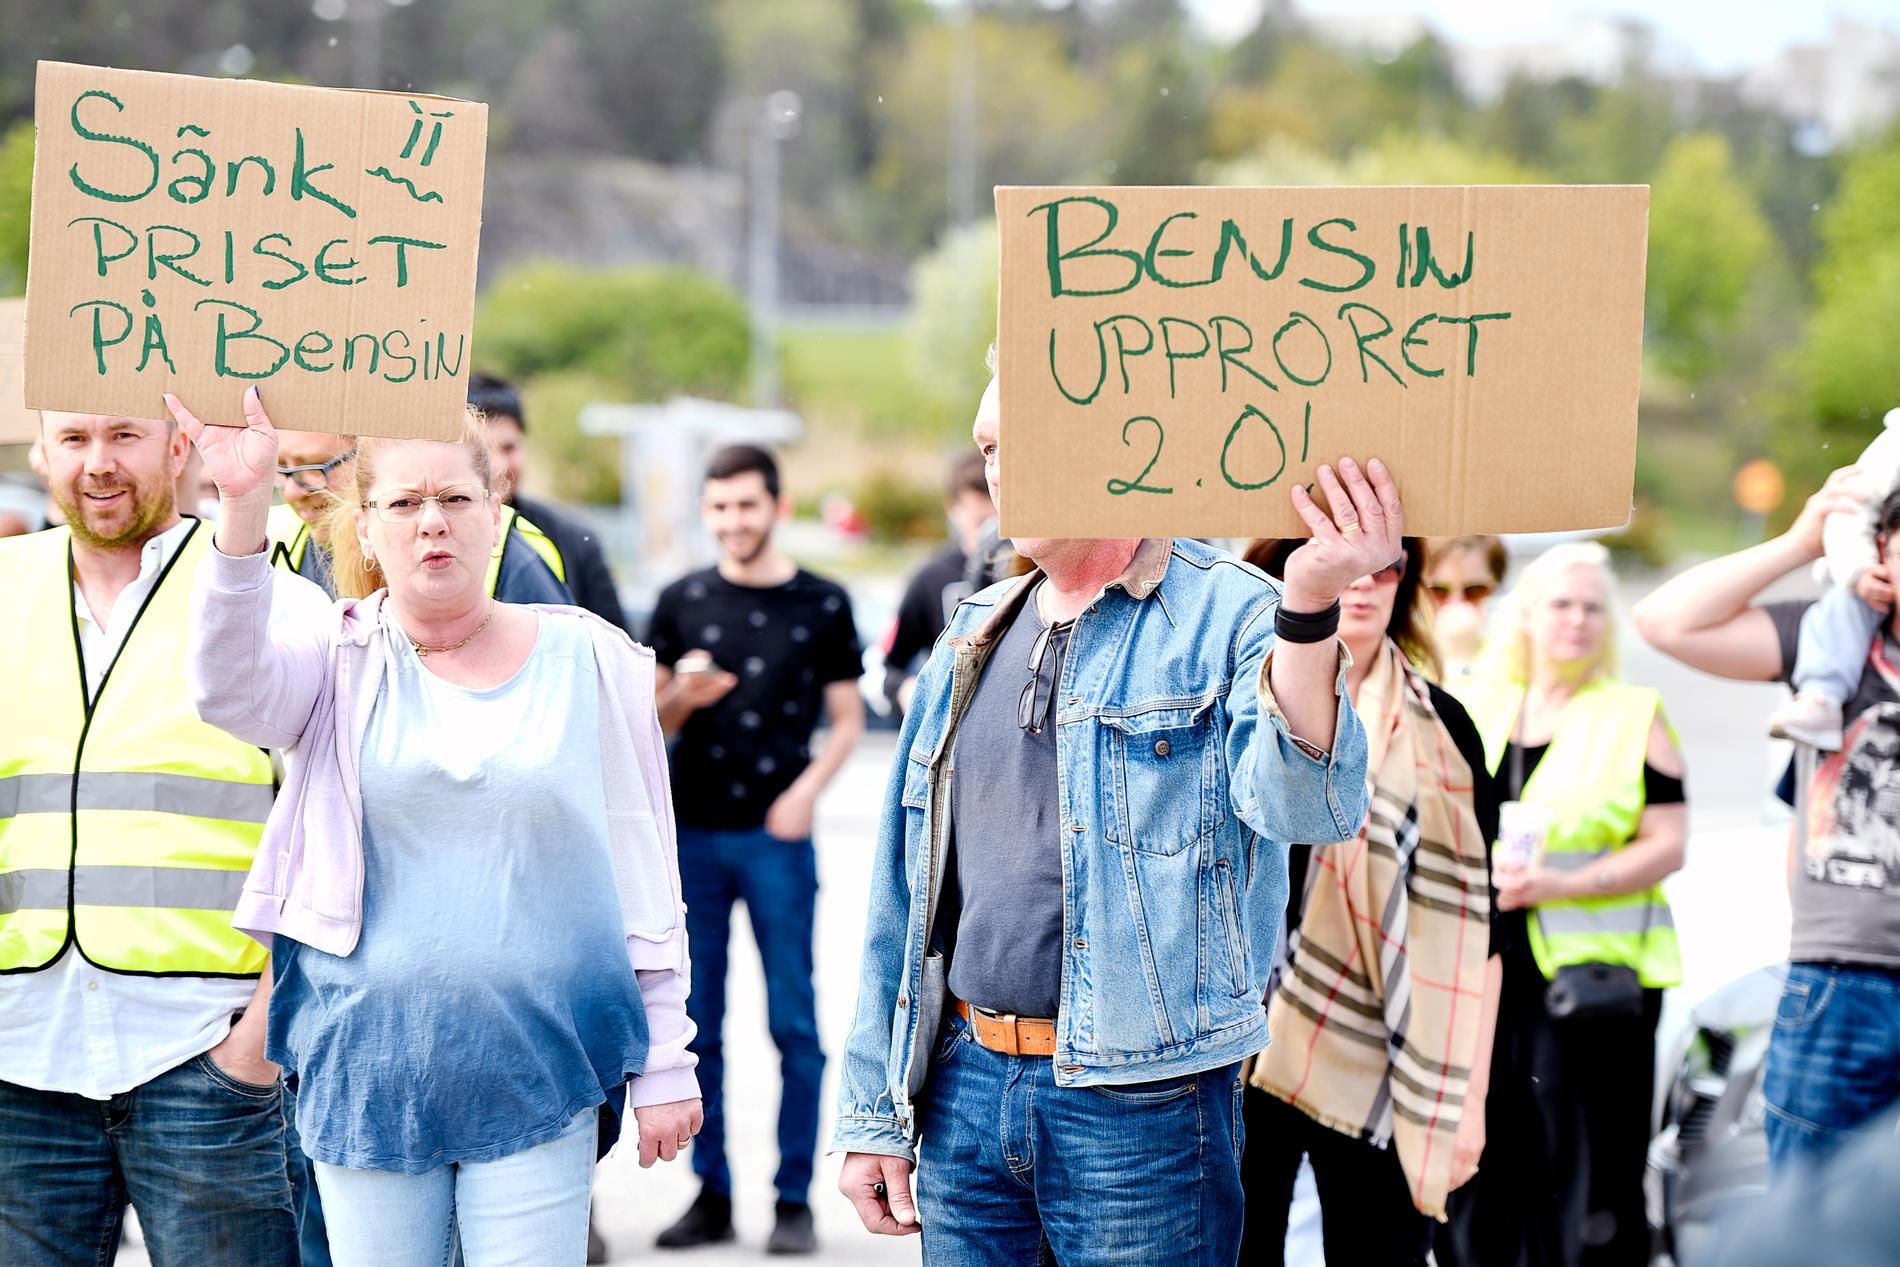 Bensinupproret 2.0 demonstrerar i Barkaby i maj.